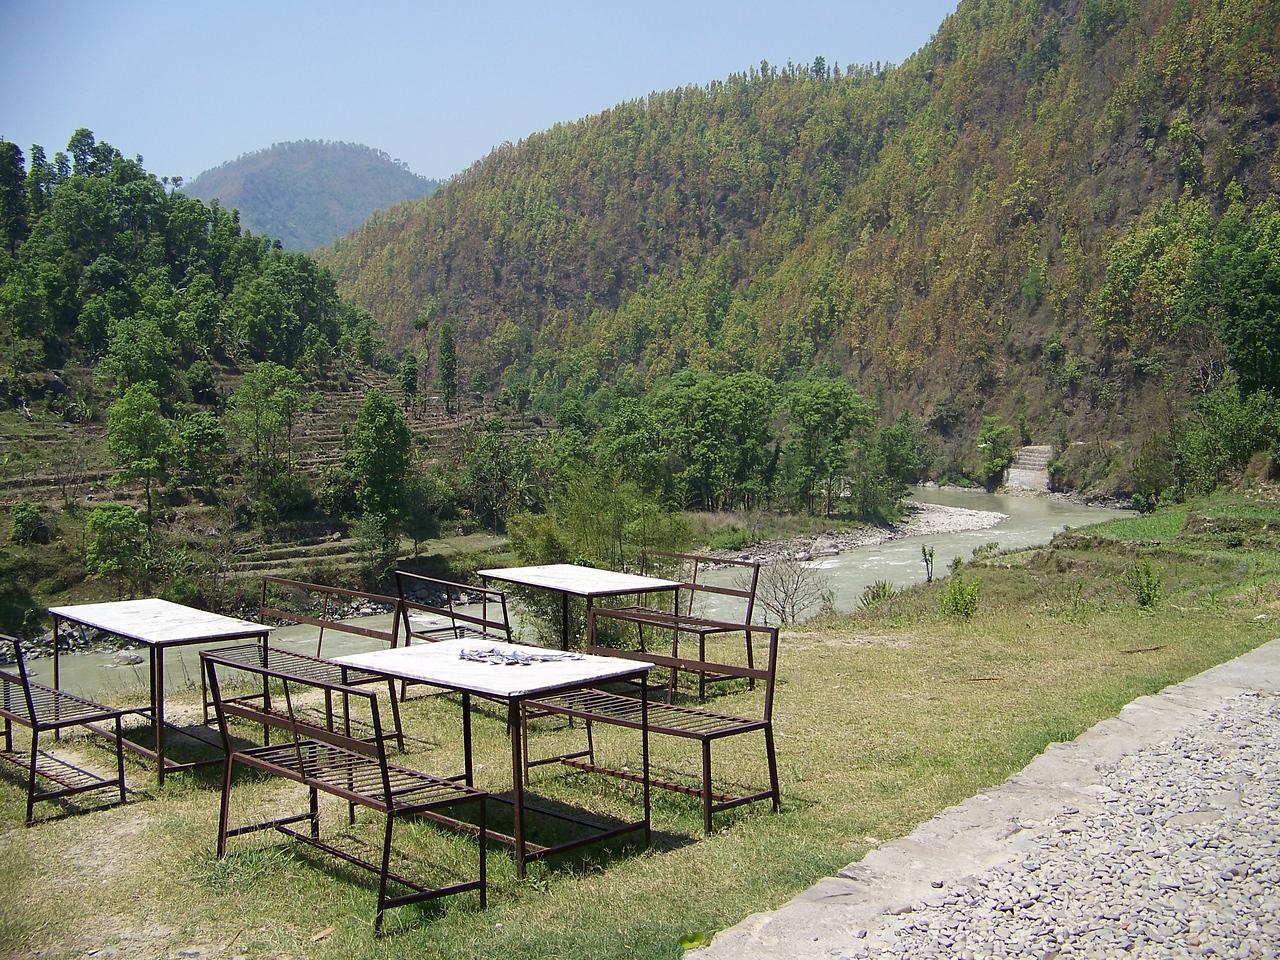 0656 - Tables at River Veiw Restaurant overlooking the Bhote Koshi River - Andheri Shidhupalchowk Nepal.JPG